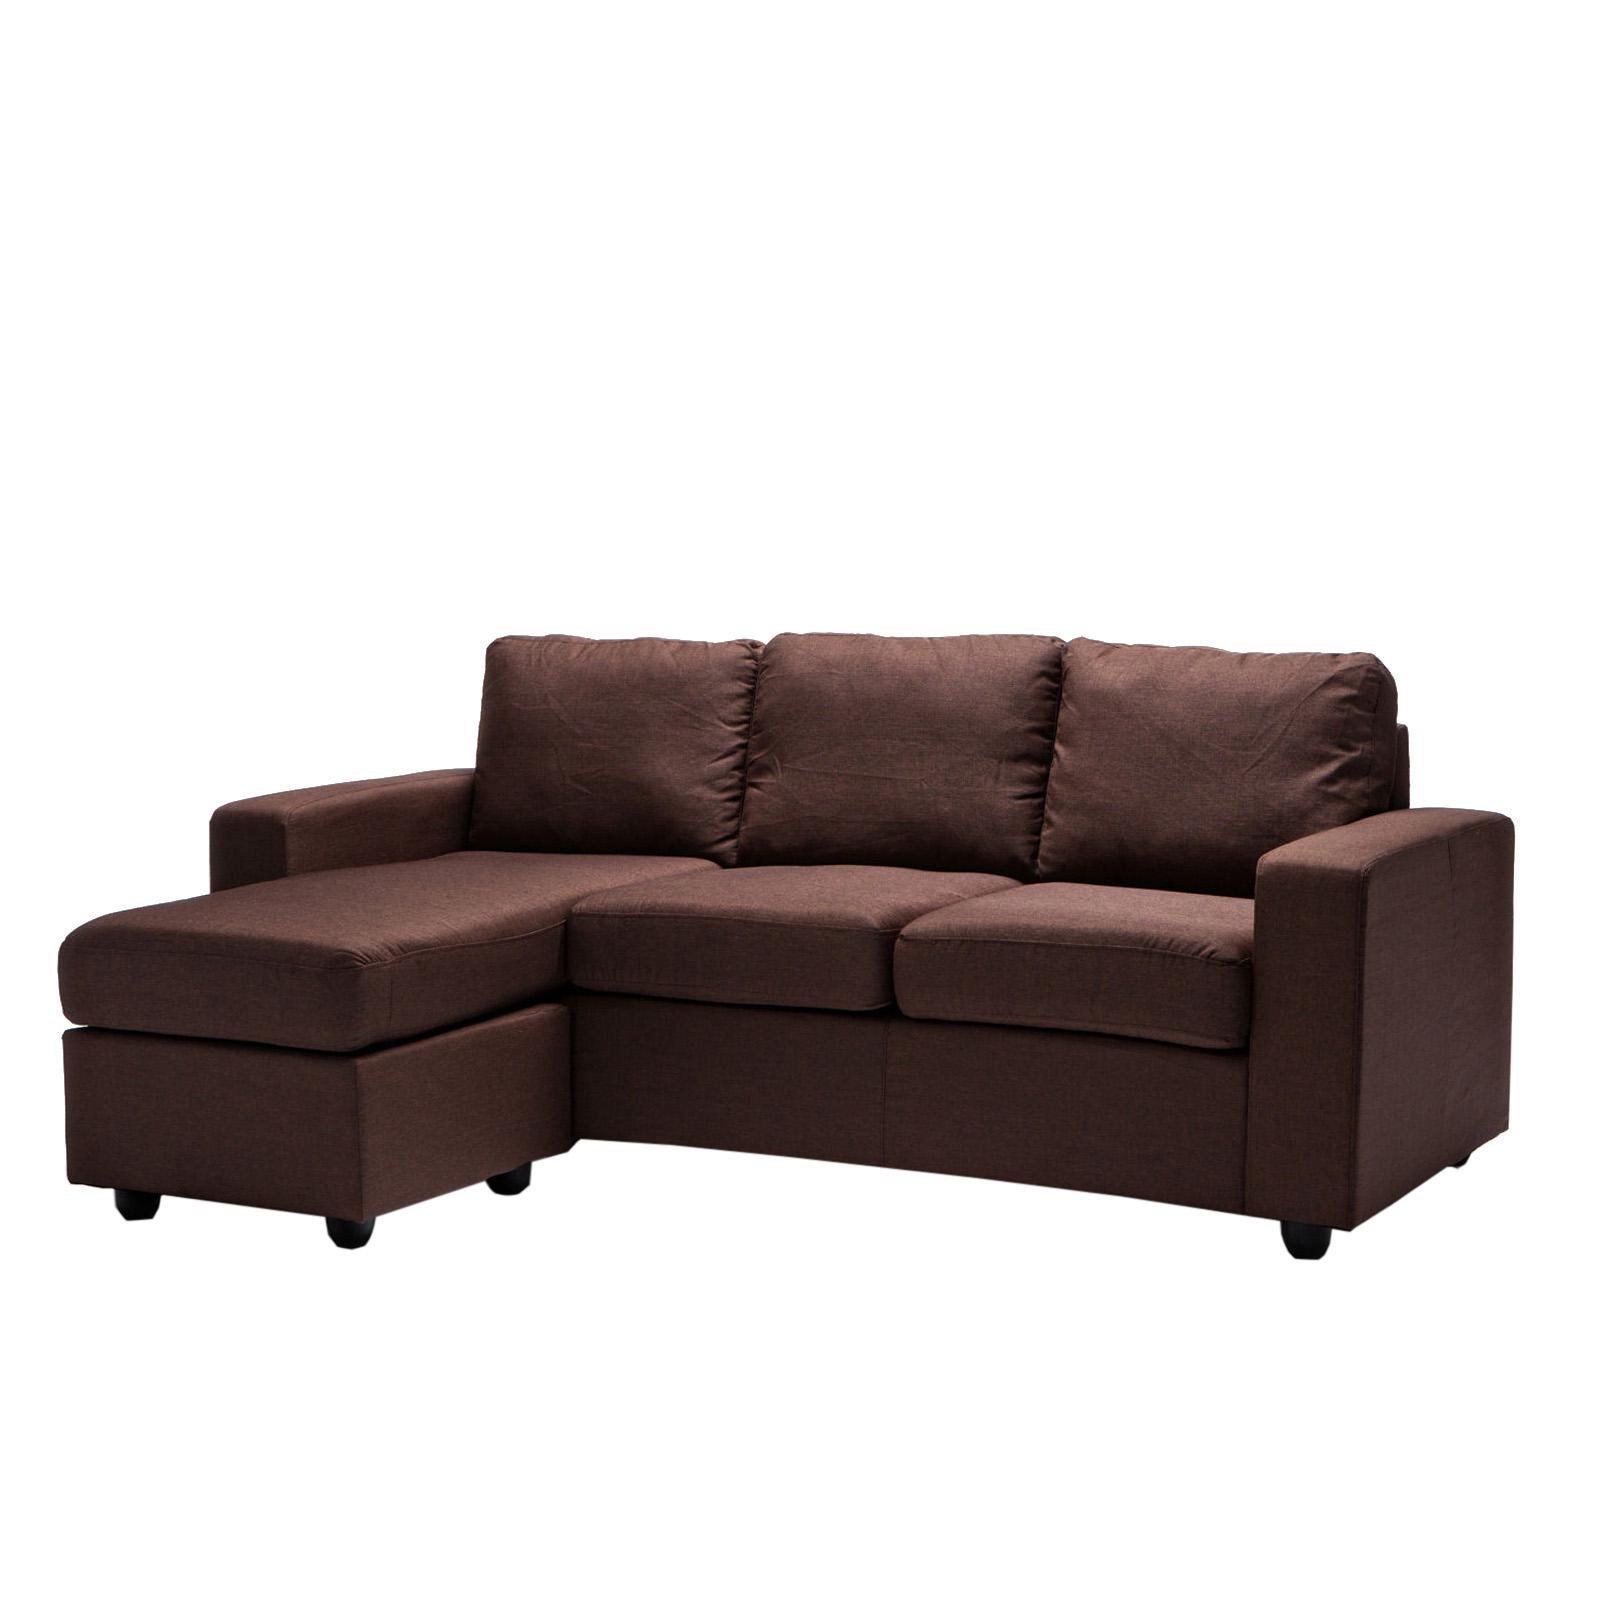 Ella Fabric 3 Seater L Shape Corner Modular Sofa Couch Lounge with